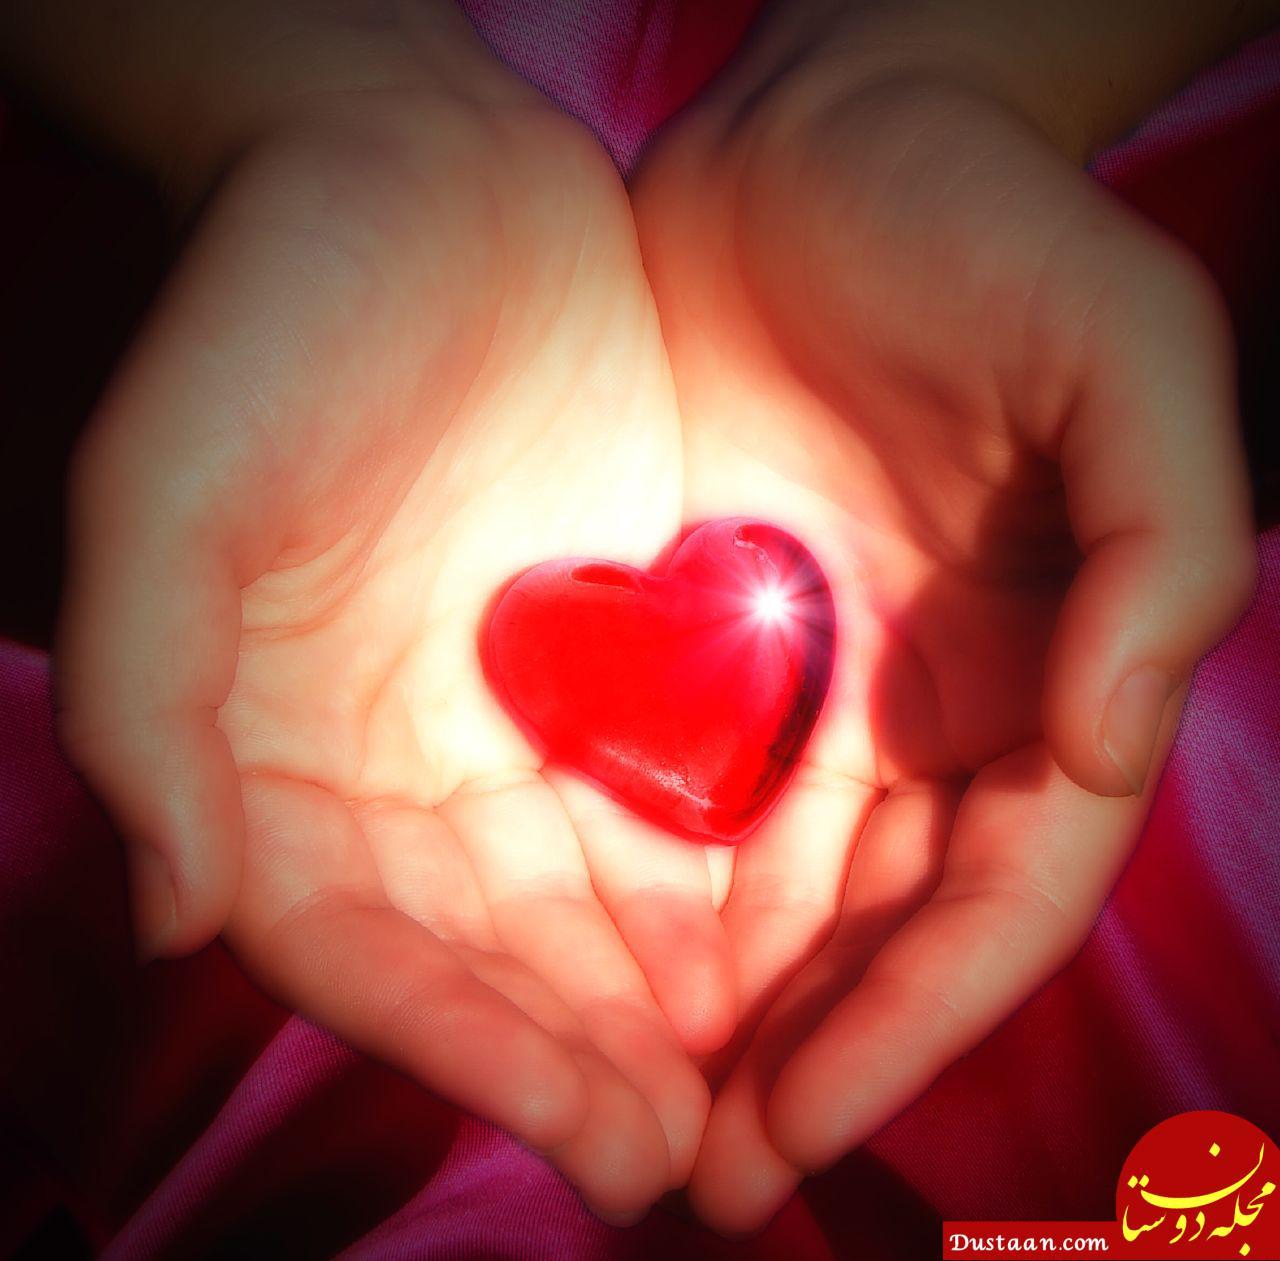 www.dustaan.com 10 روش برای به دست آوردن دل زنها!